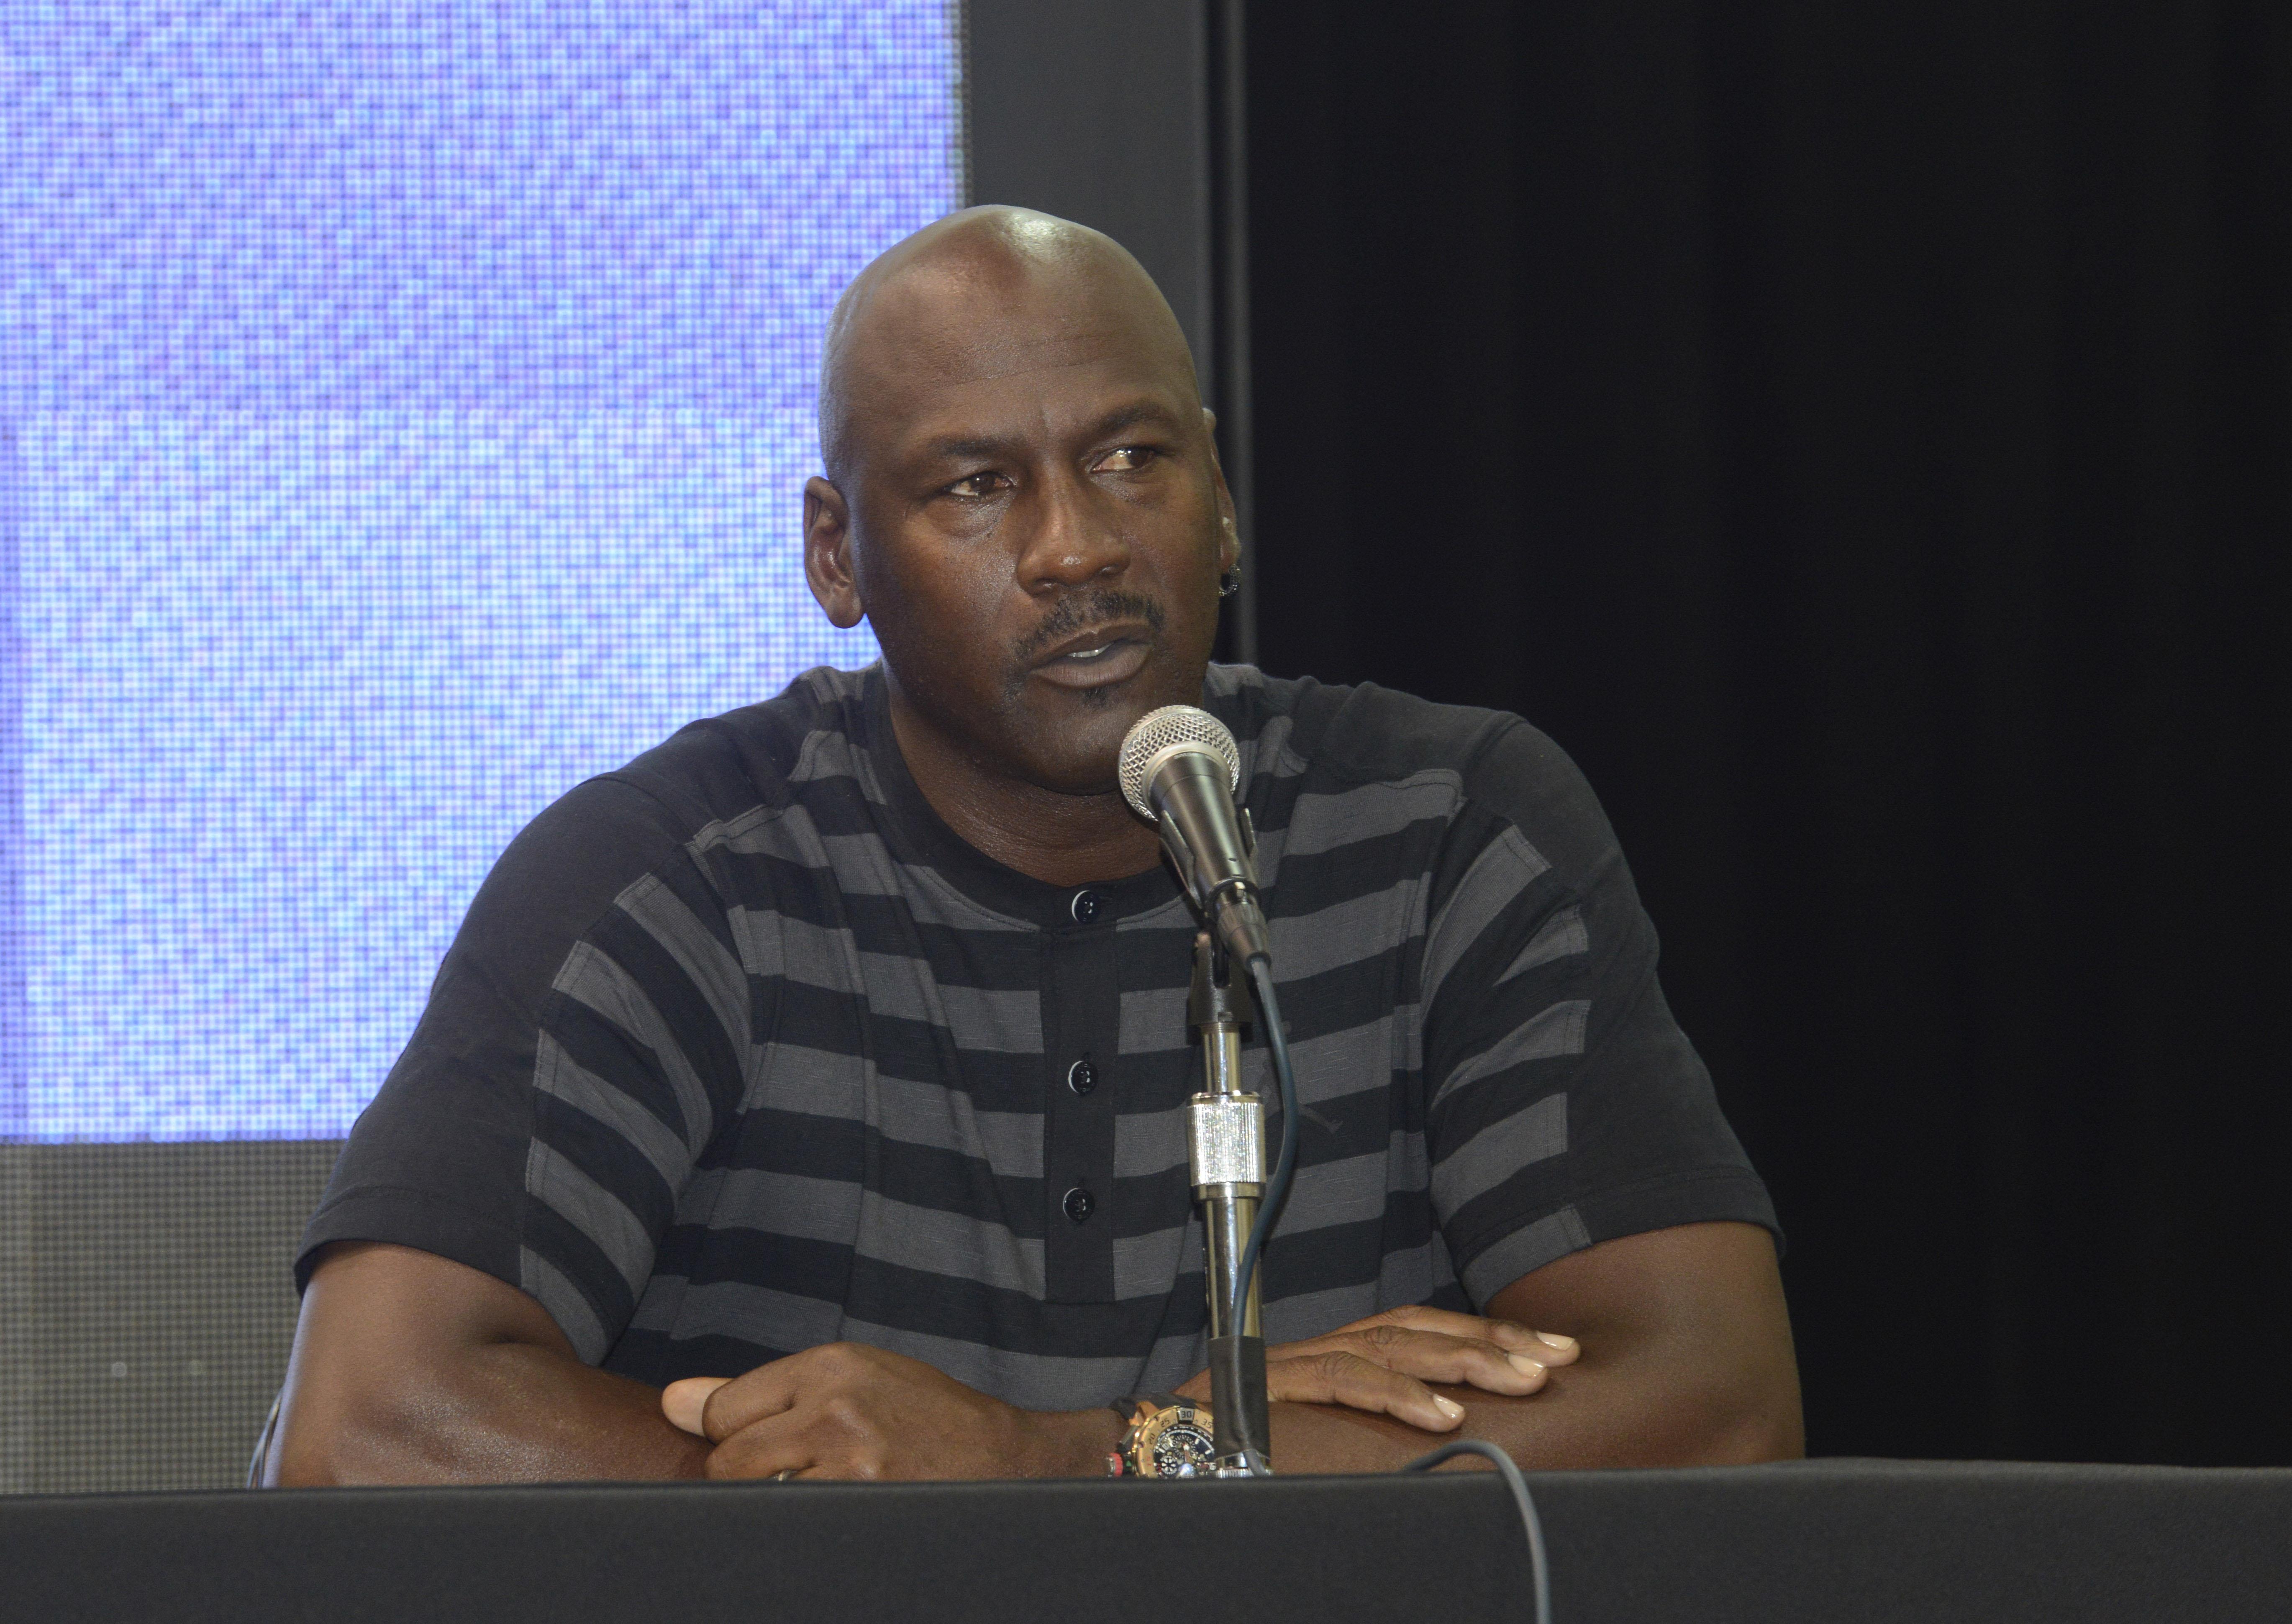 Michael Jordan's Chicago home up for auction | kare11.com